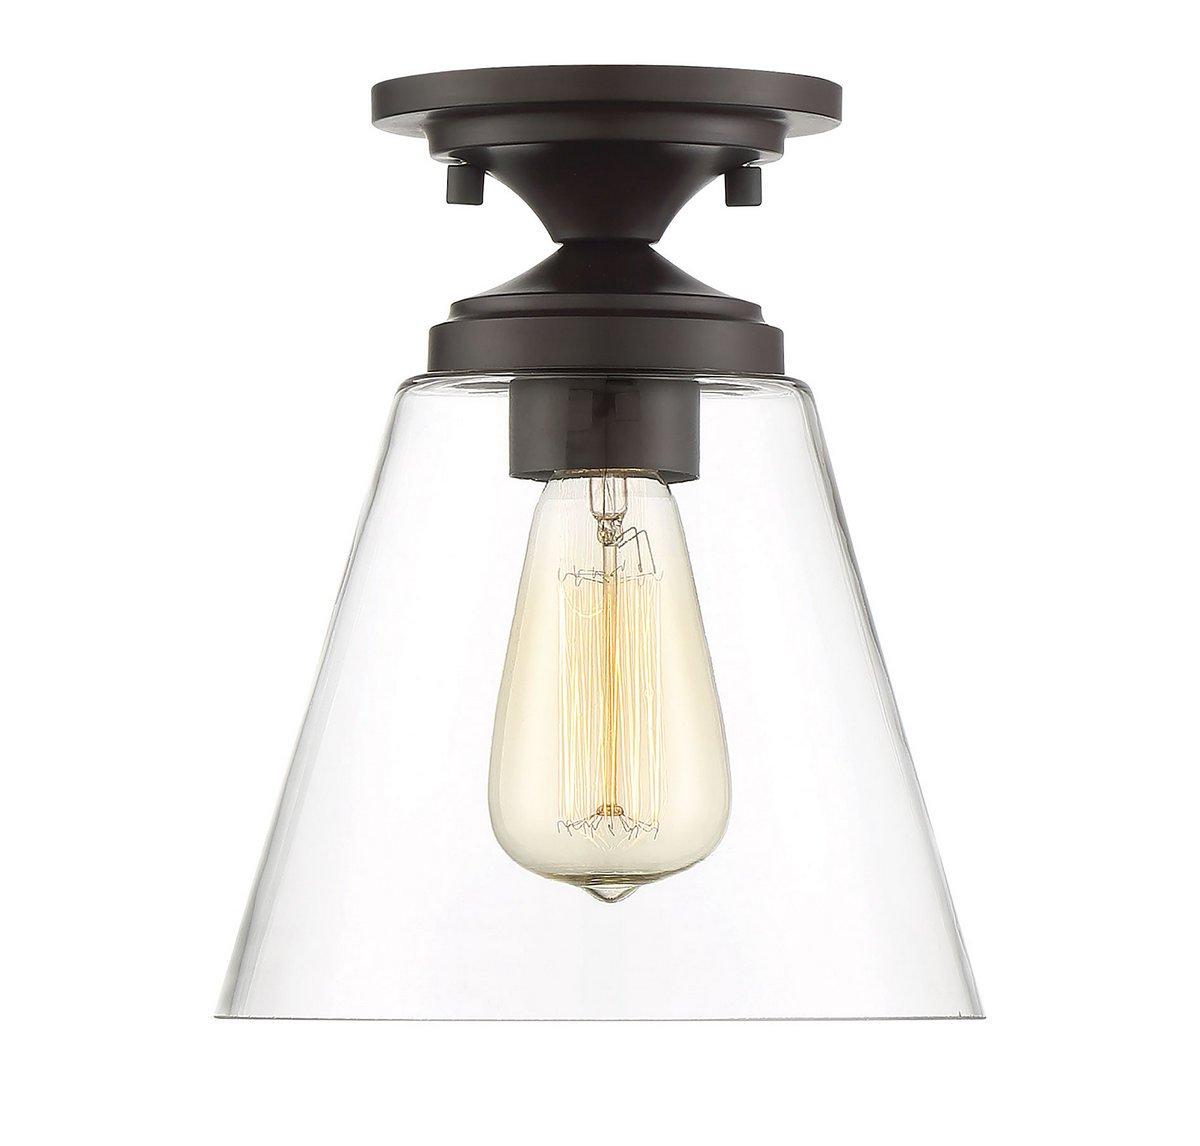 Trade Winds Lighting TW60047ORB 1-Light Transitional Semi-Flush Mount Ceiling Light, 100 Watts, in Oil Rubbed Bronze